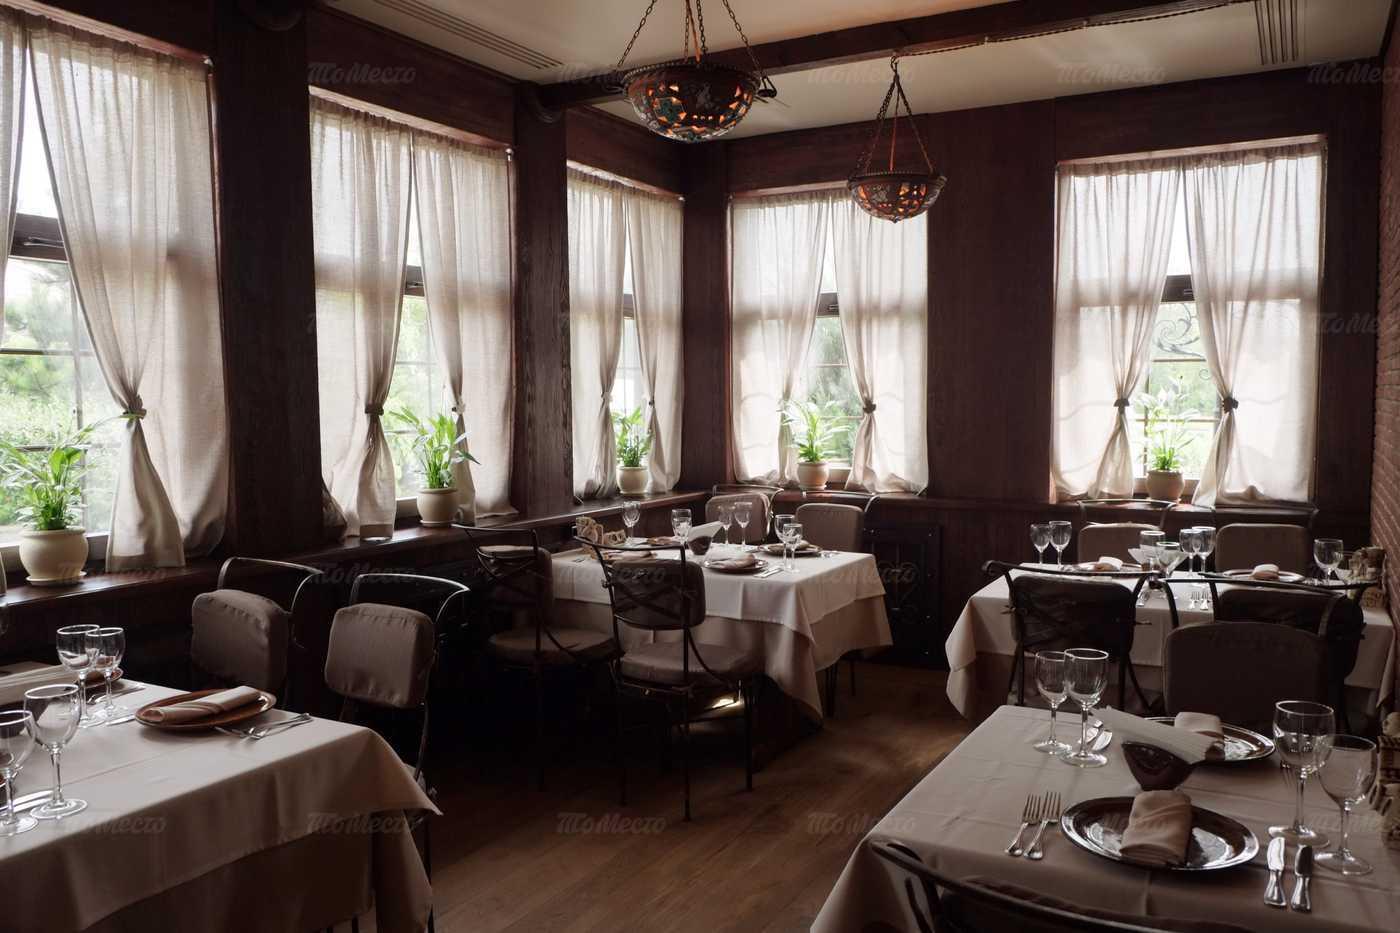 Меню ресторана Трактир Сам пришёл на проспекте Вернадского